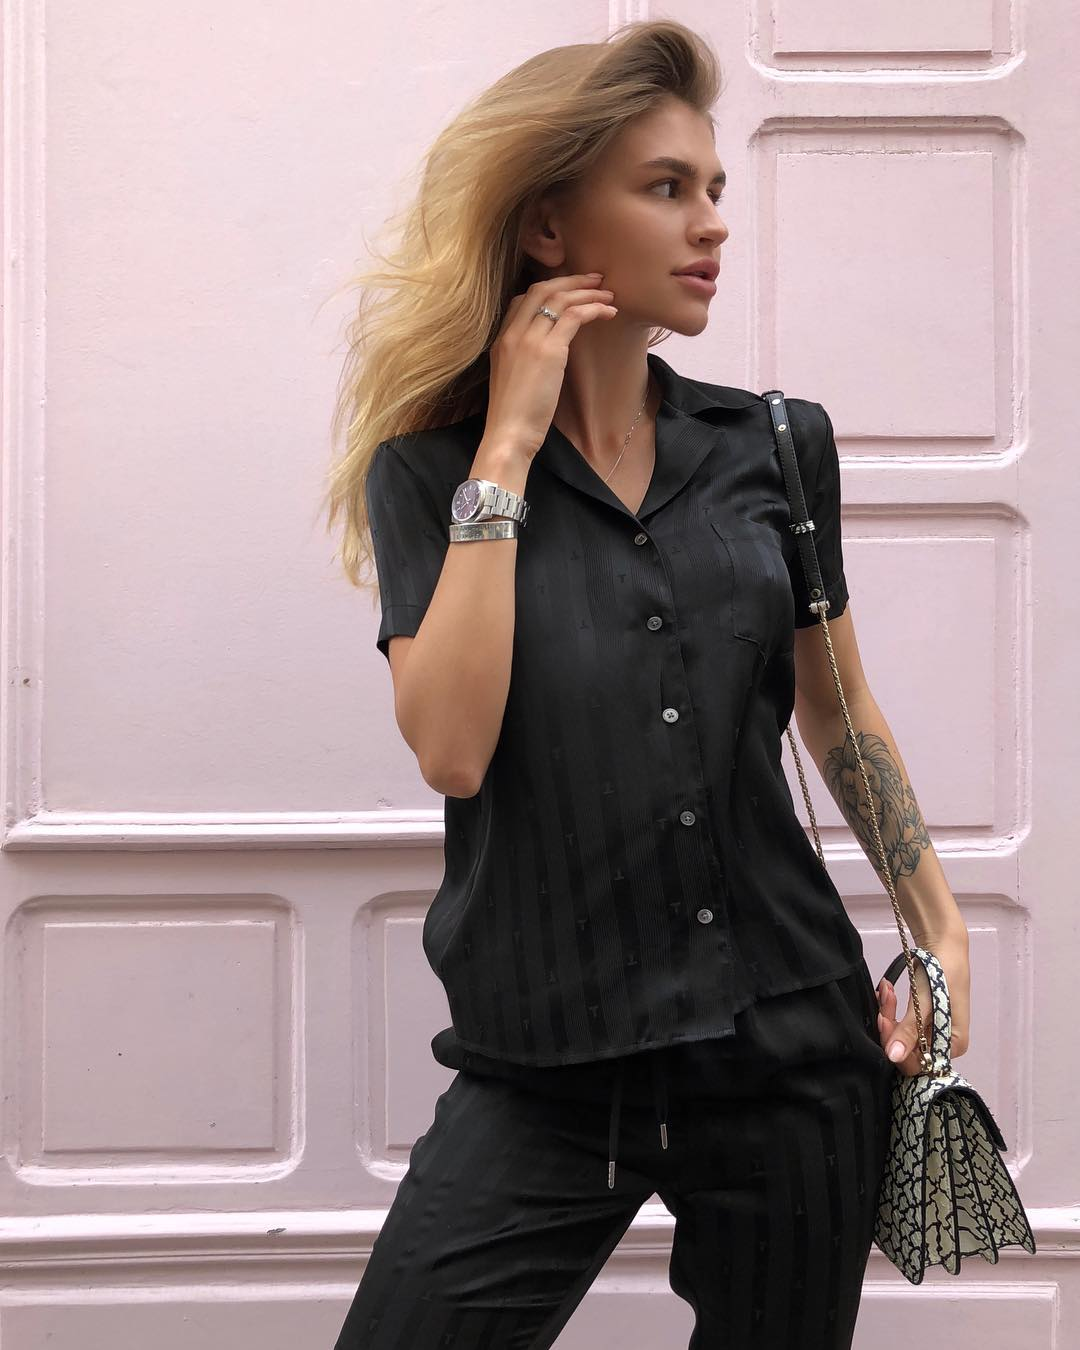 Anastasia-Mironova-Wallpapers-Insta-Fit-Bio-4